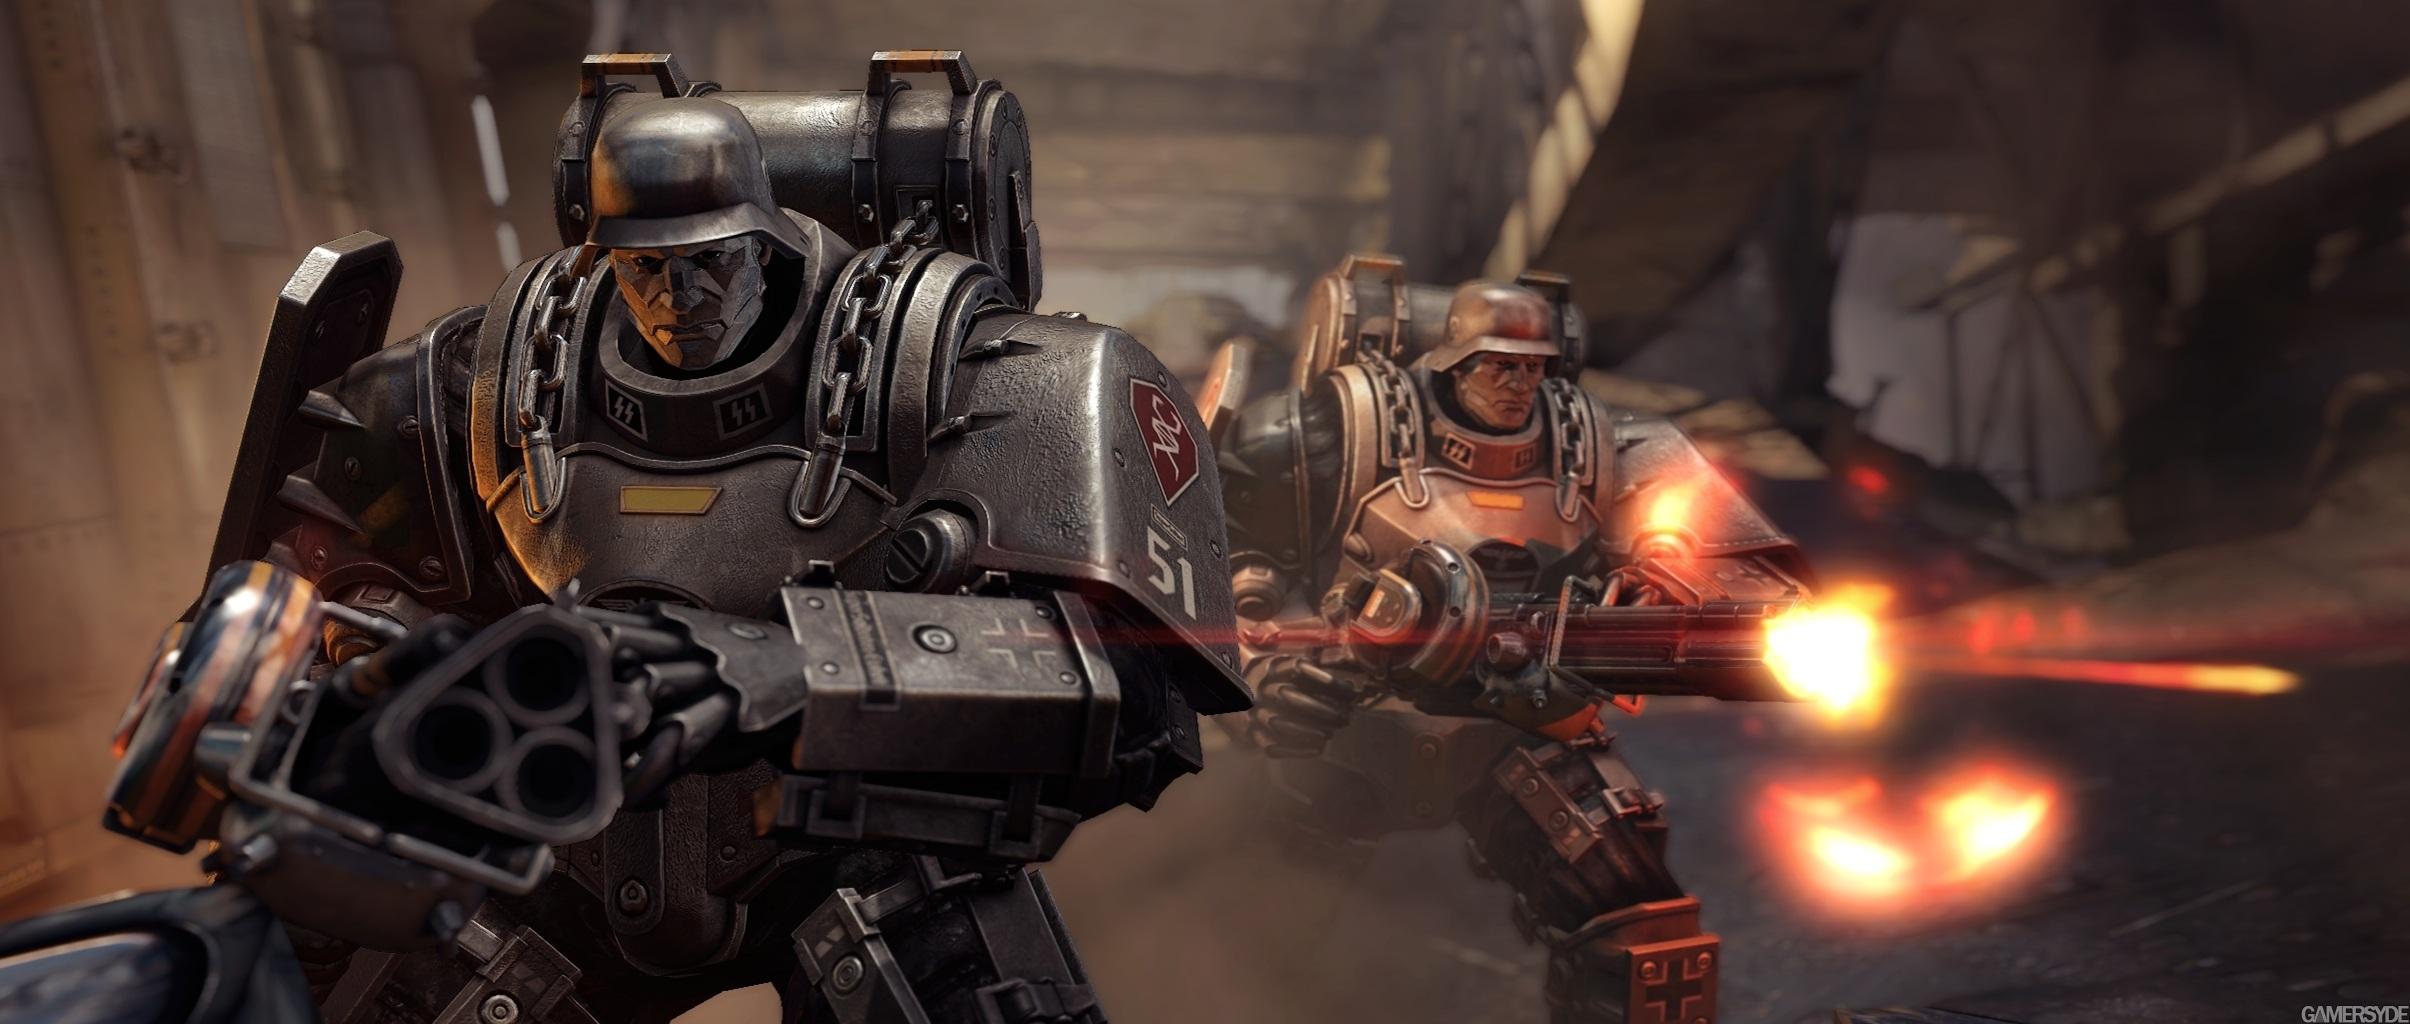 Uber Soldat (Wolfenstein The New Order) vs  Spartan III (Halo